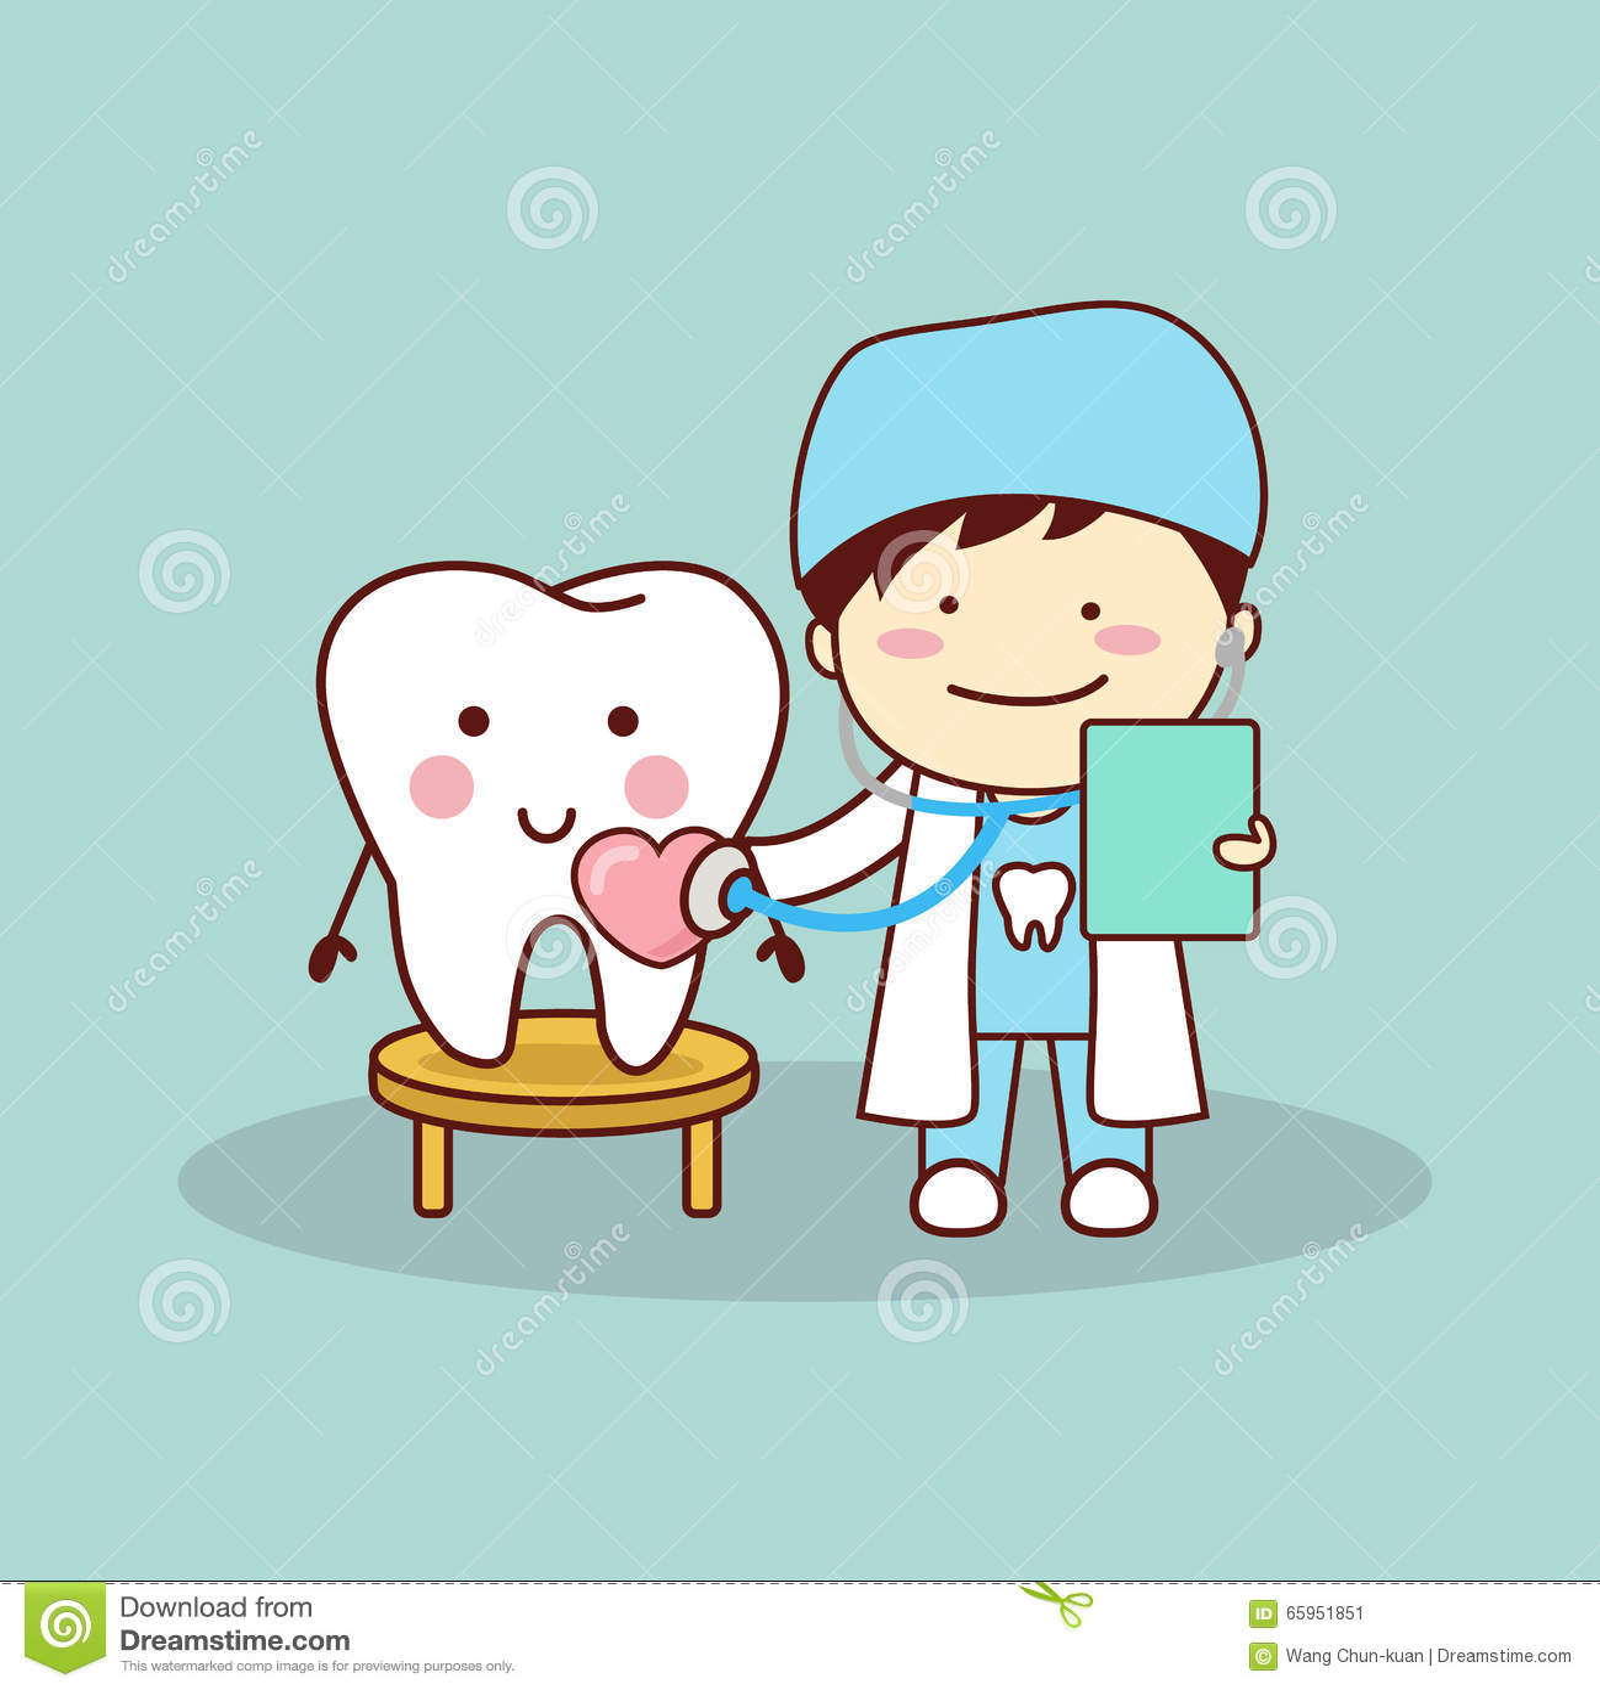 happy-cartoon-tooth-dentist-stethoscope-great-health-dental-care-concept-65951851.jpg